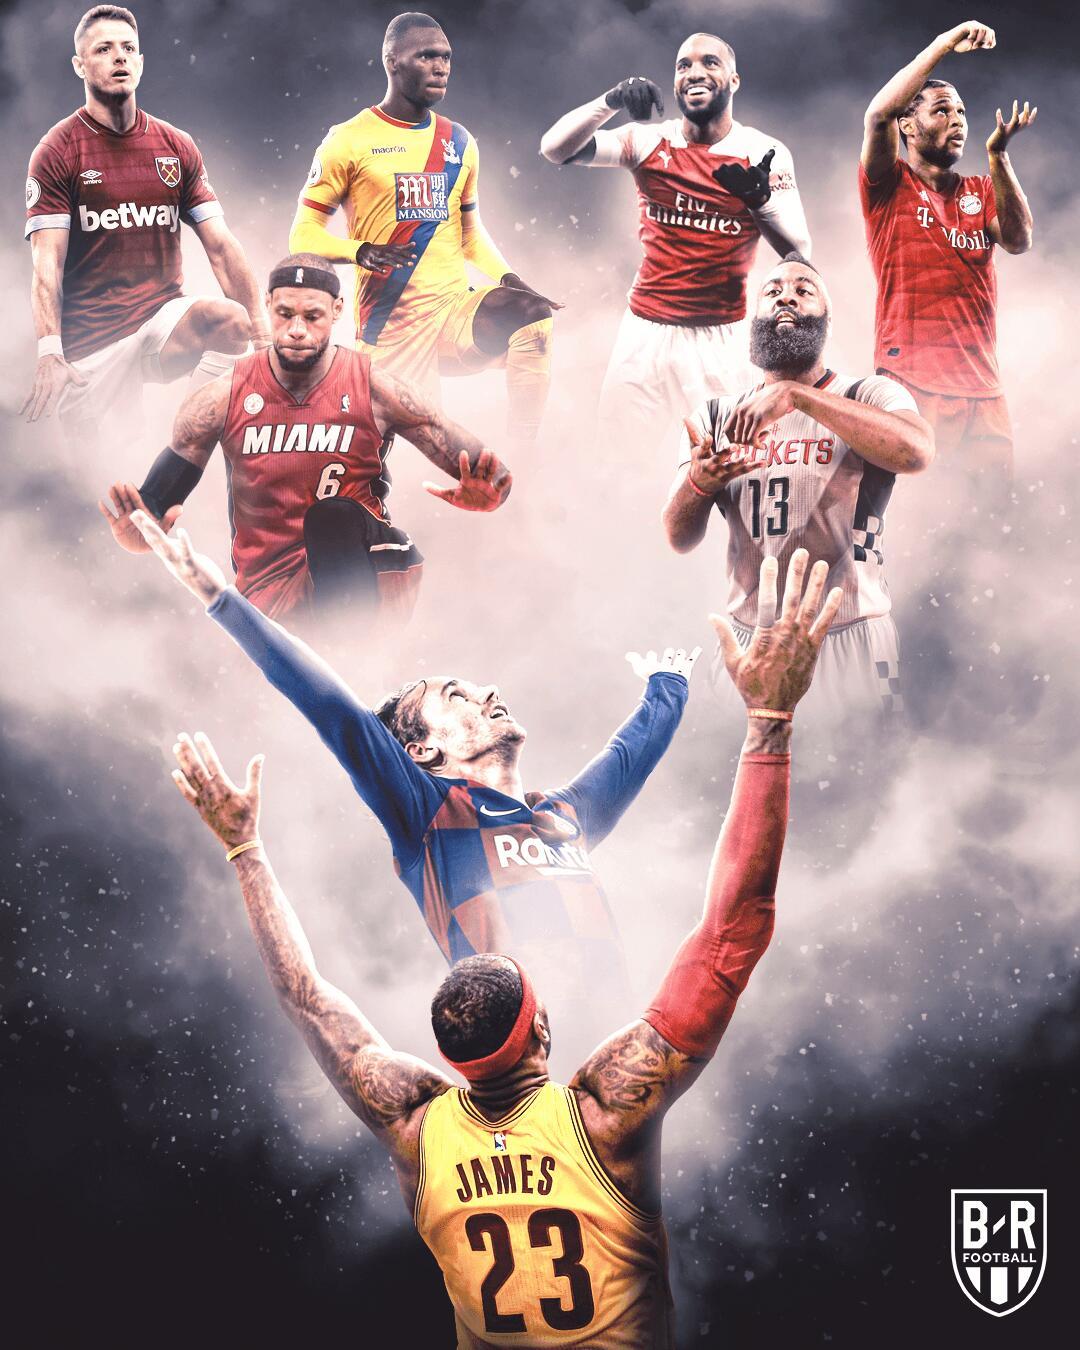 B/R海报:足篮跨界,那些模仿NBA球星祝贺行作hg0088官网球员